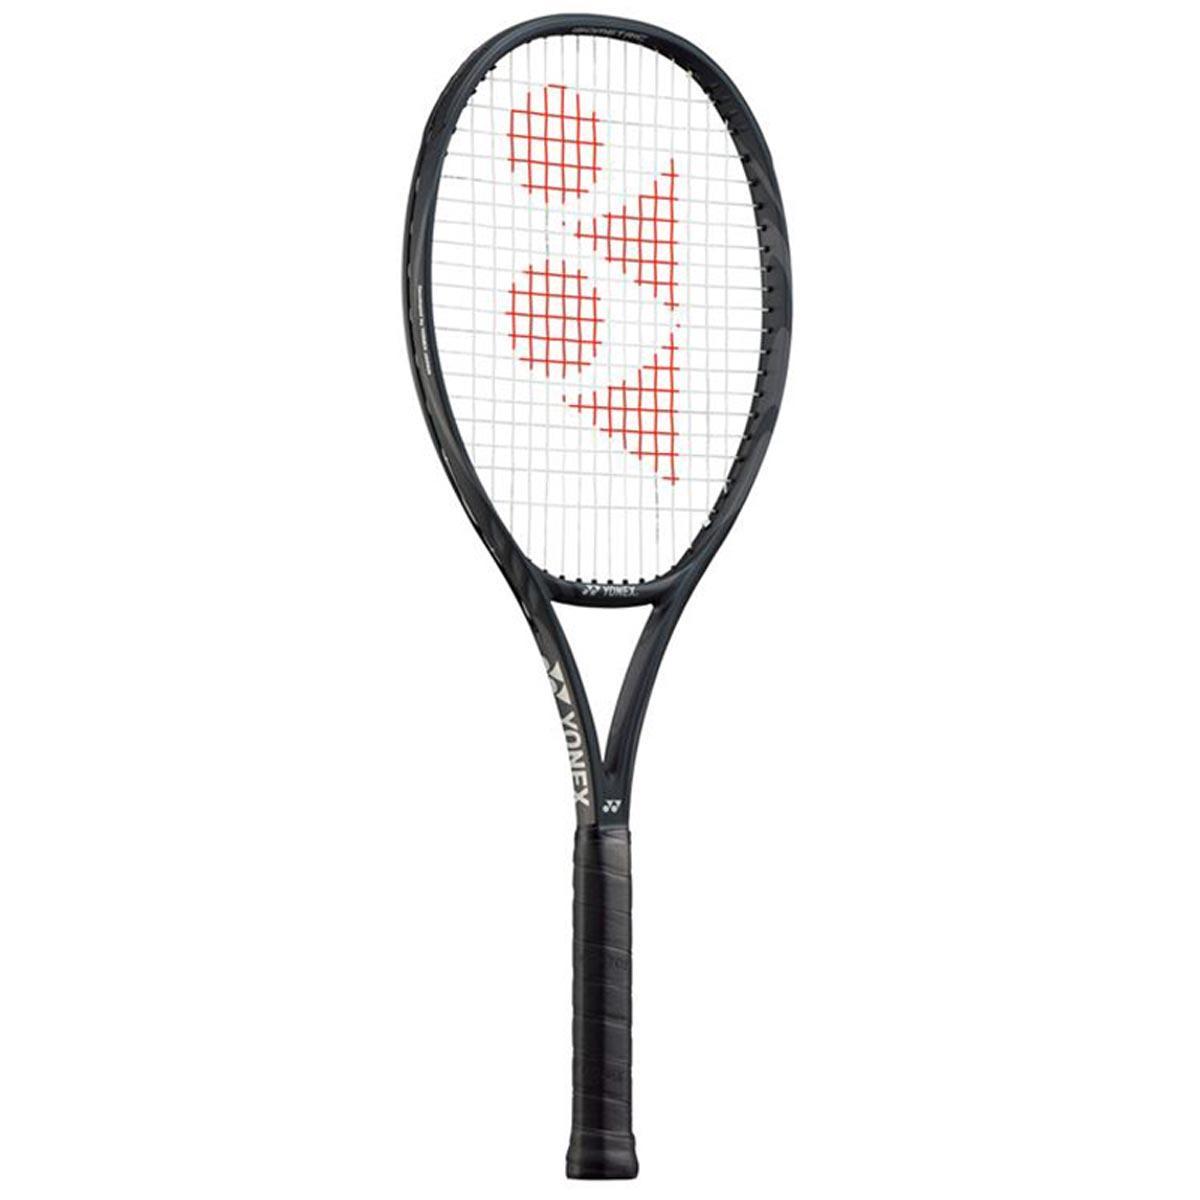 Buy Yonex Vcore Game Tennis Racquet 270gm Strung Online